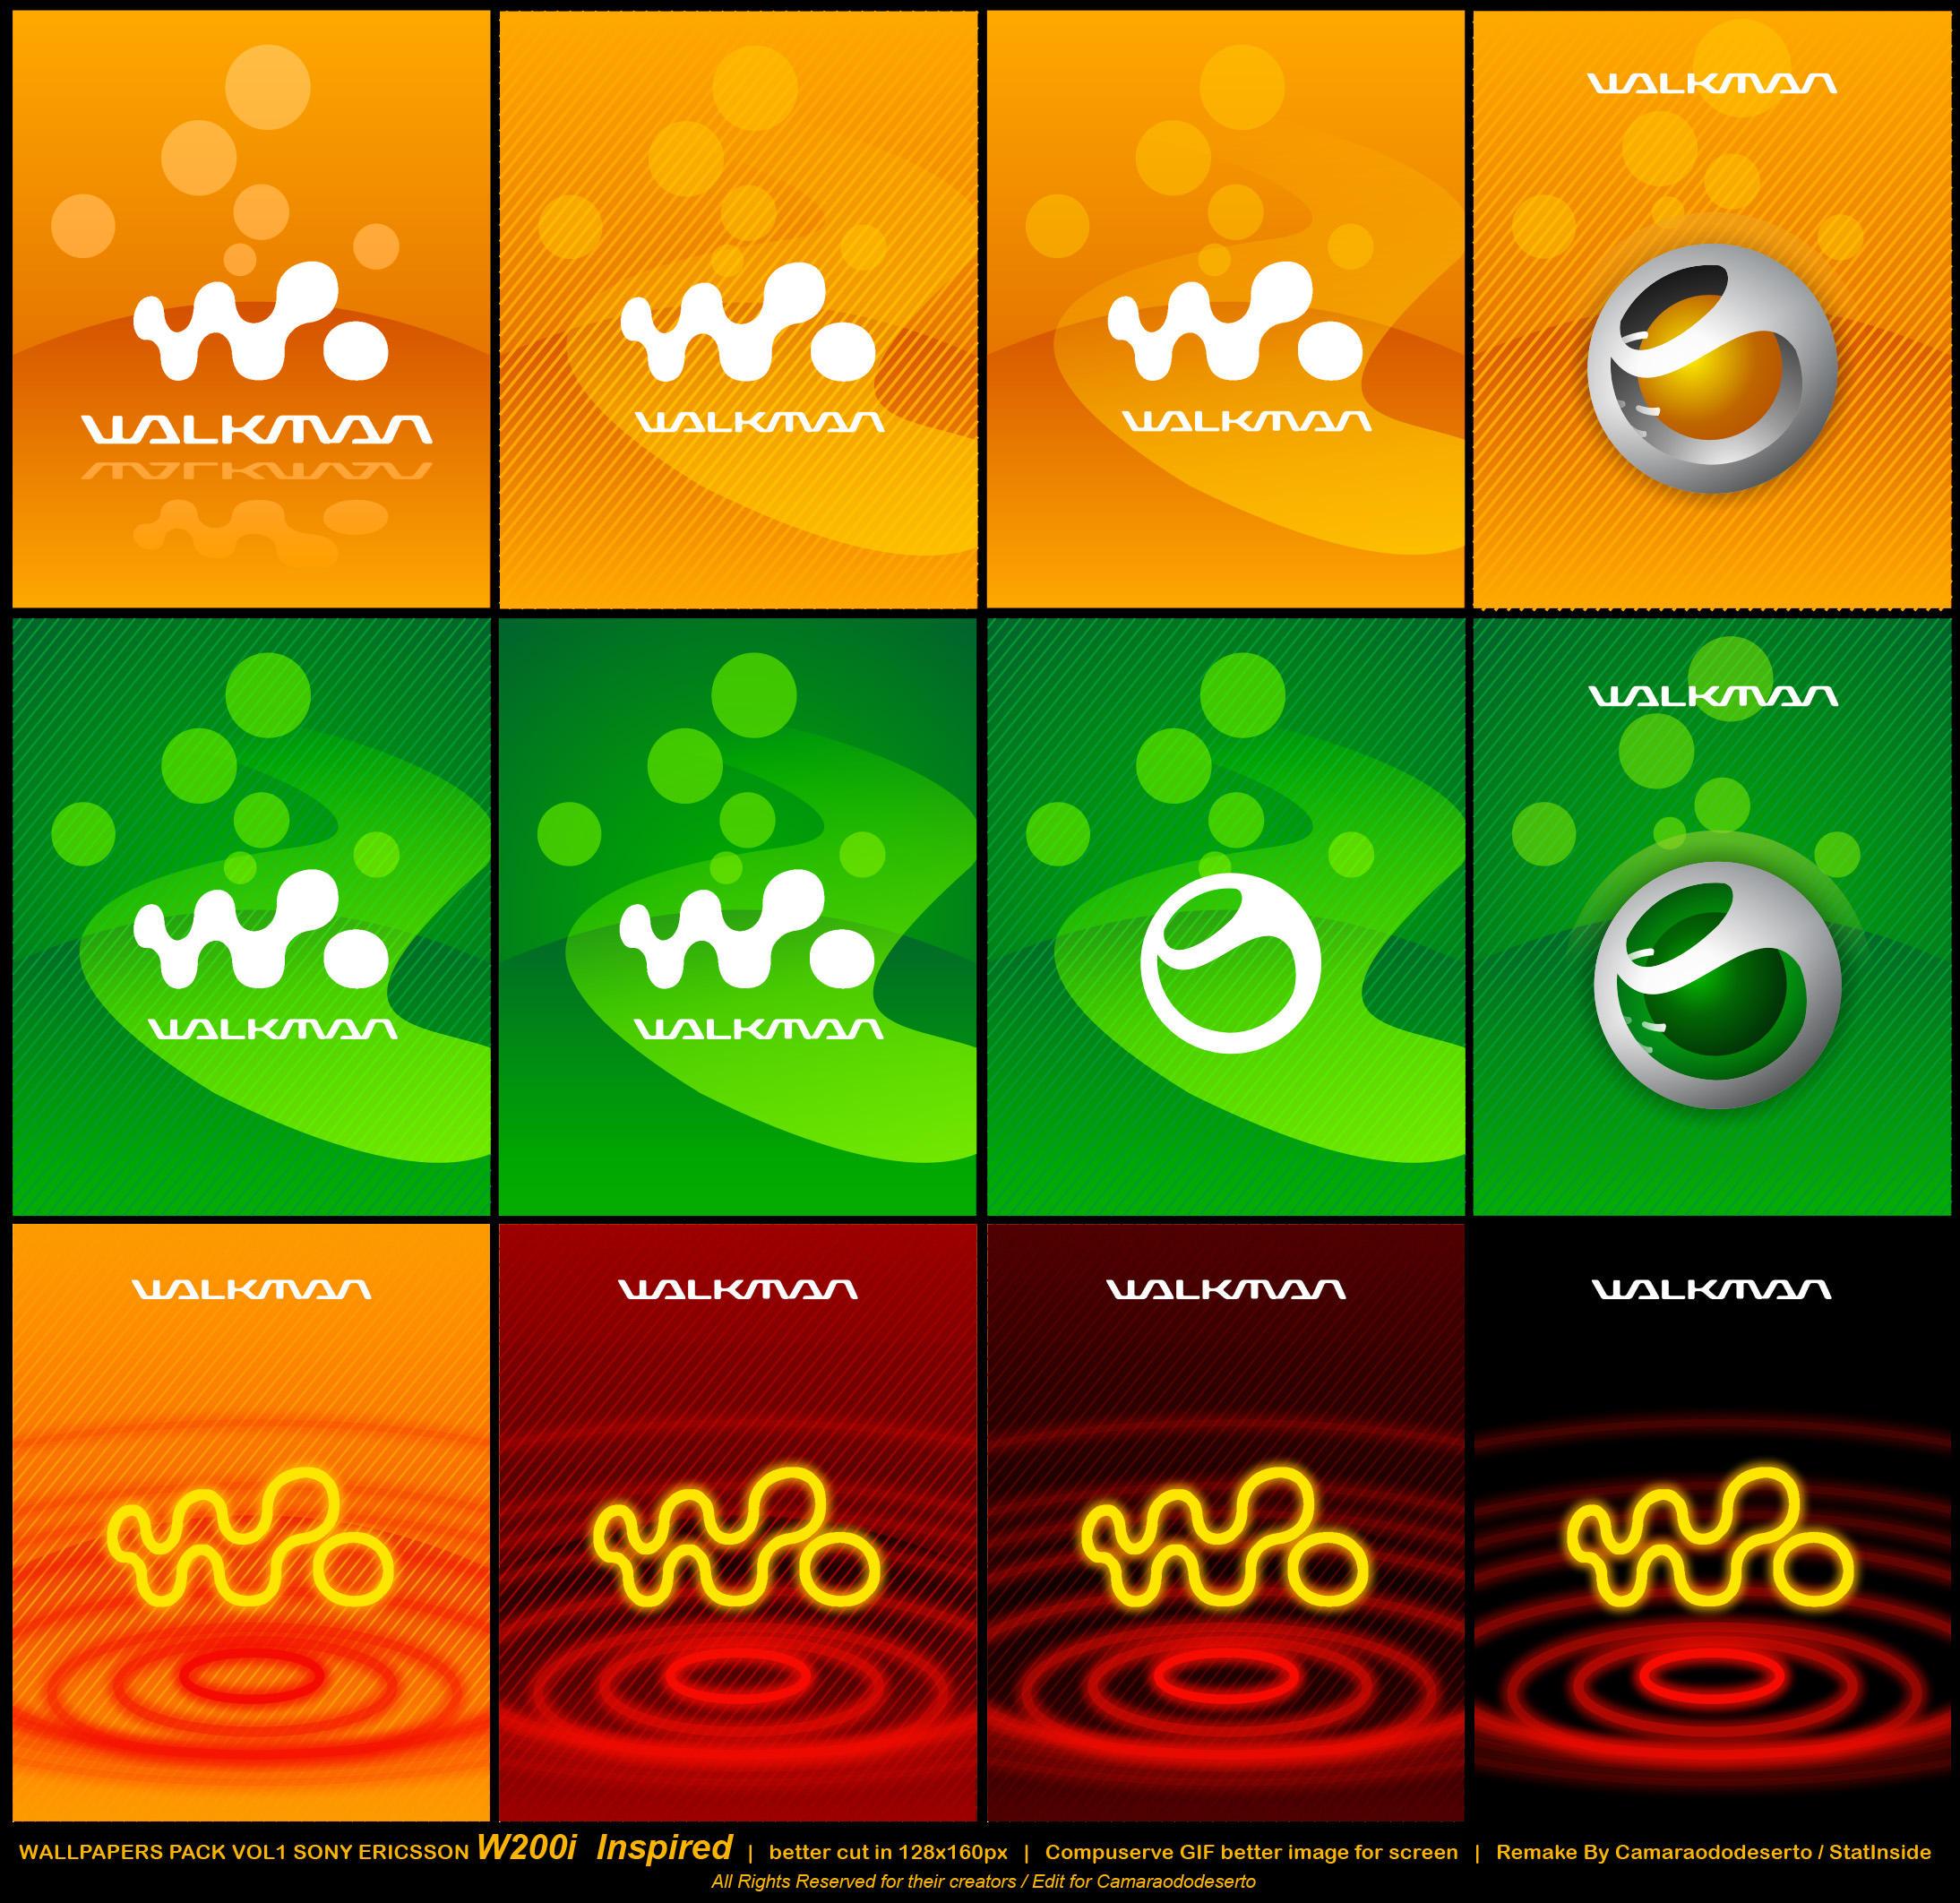 WALLPAPERS SONY ERICSSON W200i by mwtntnet